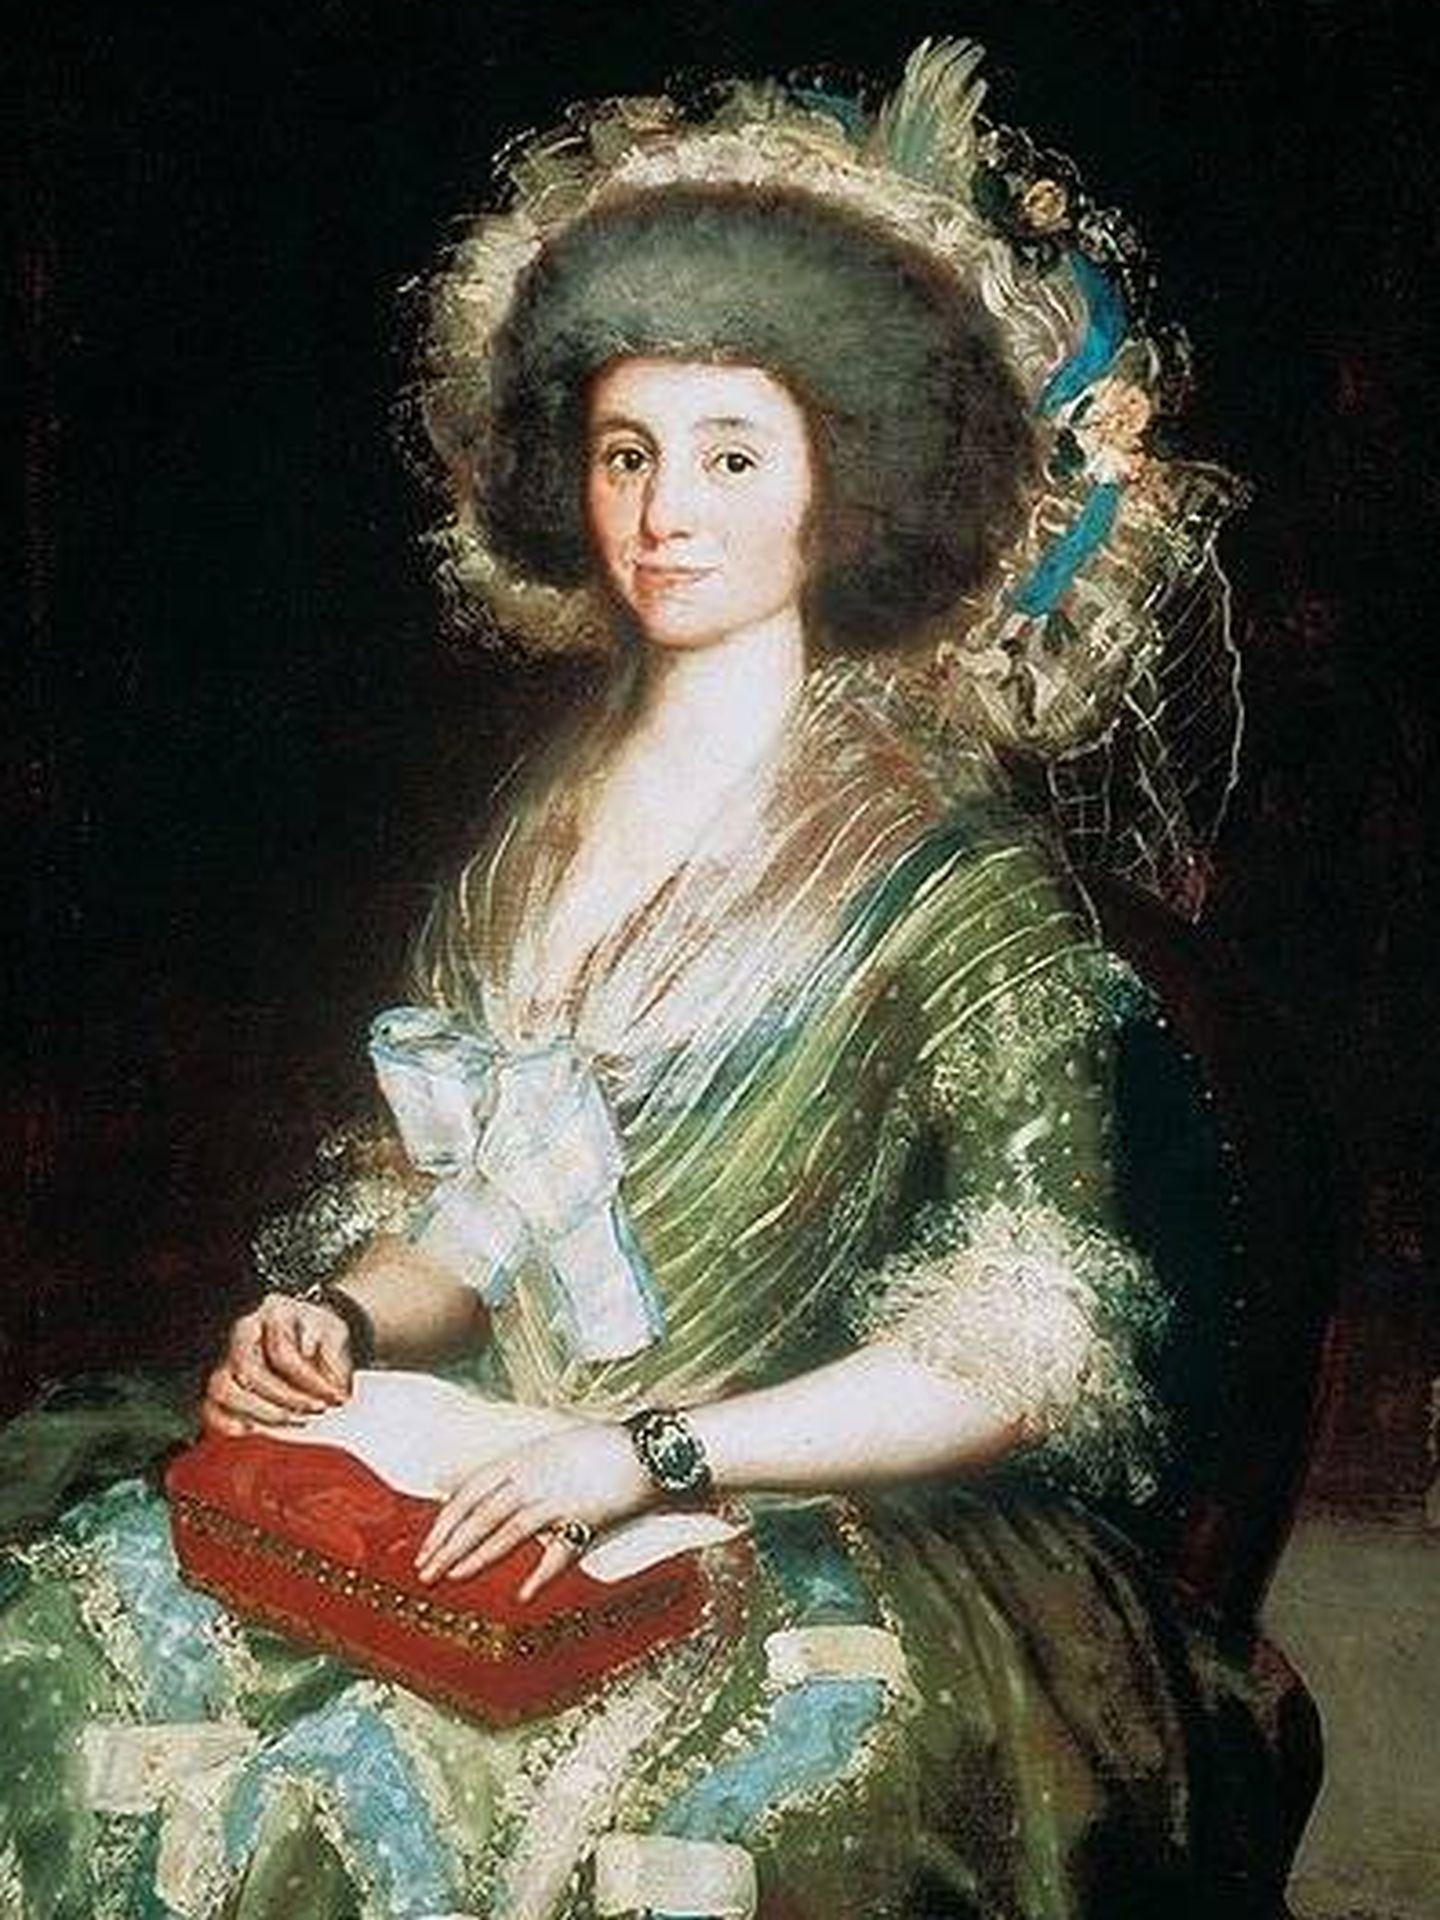 'Retrato de 'Manuela Camas' - Goya (1792-93)